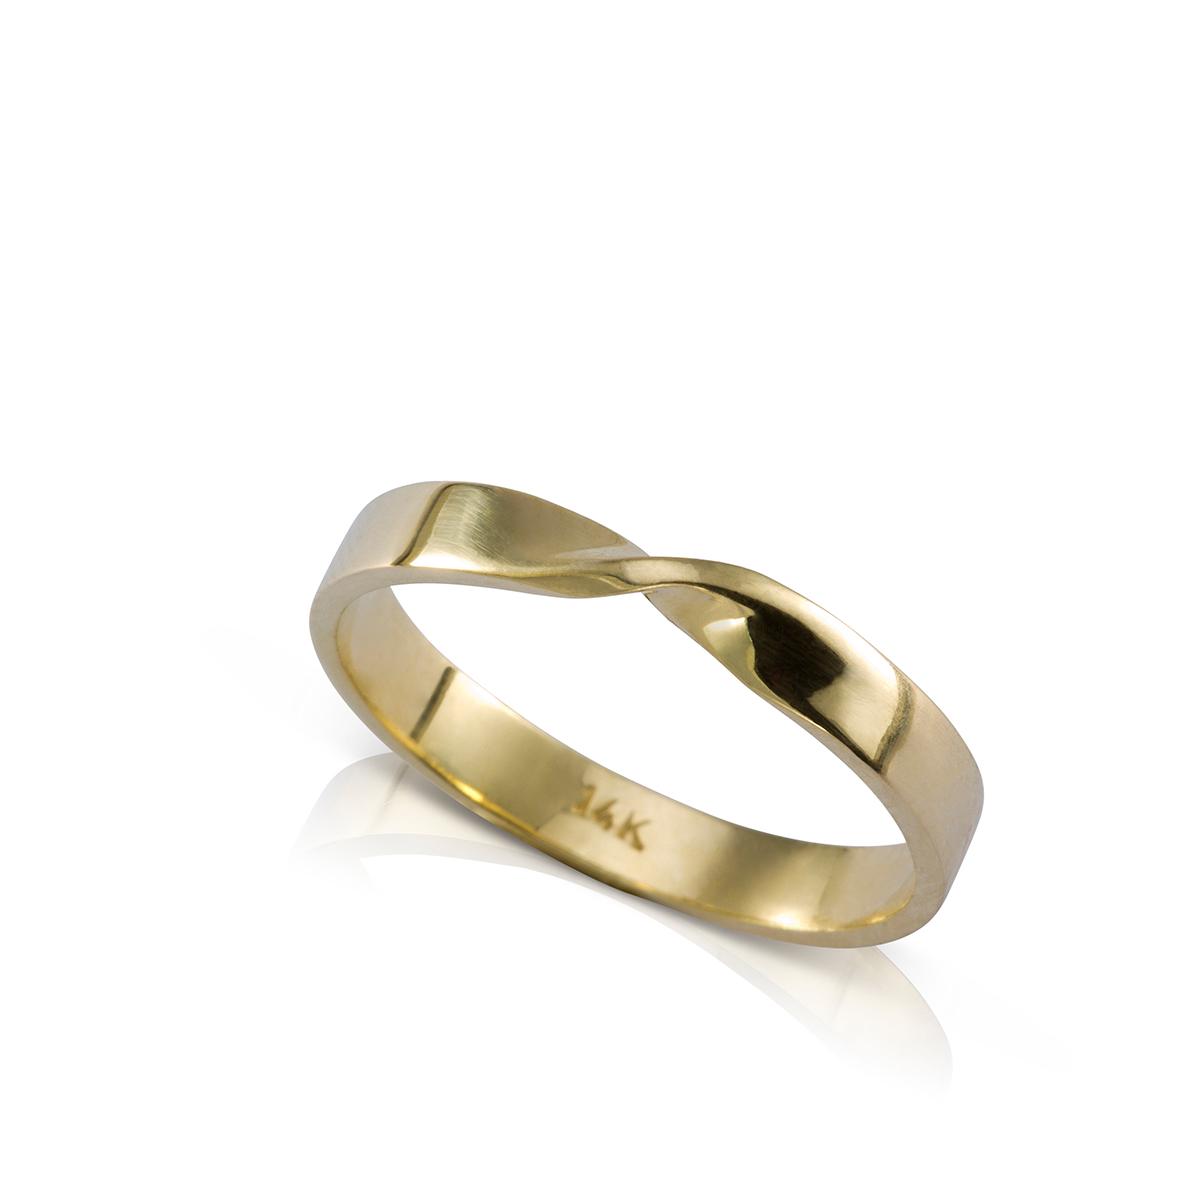 Mobius shaped gold ring.